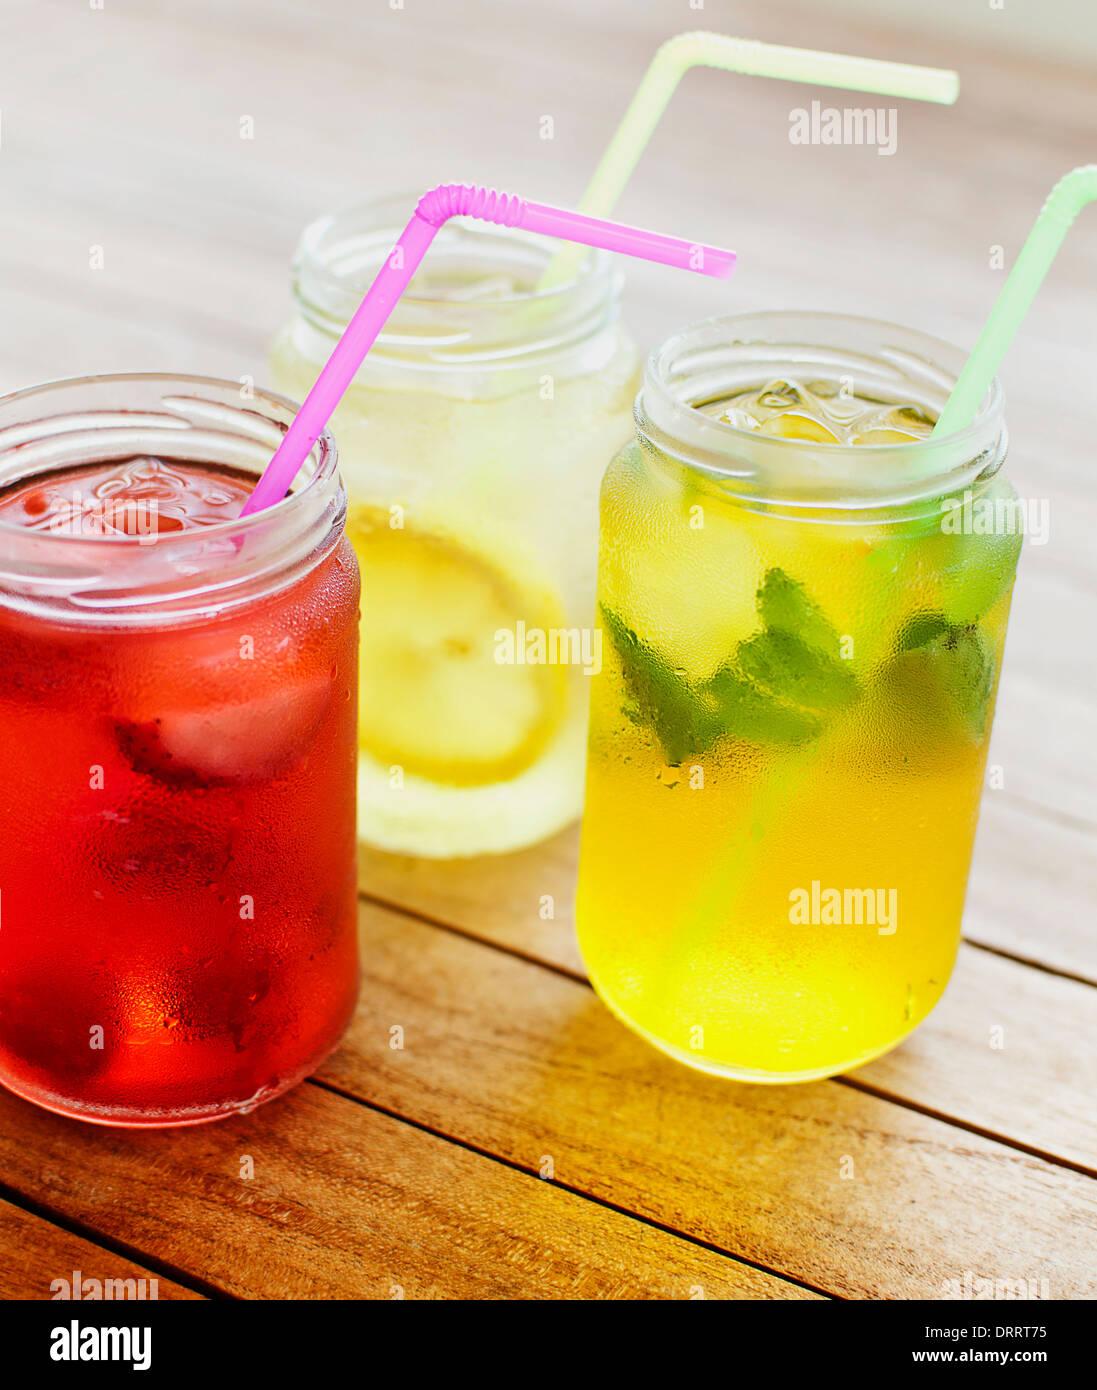 Bebidas de fruta Imagen De Stock